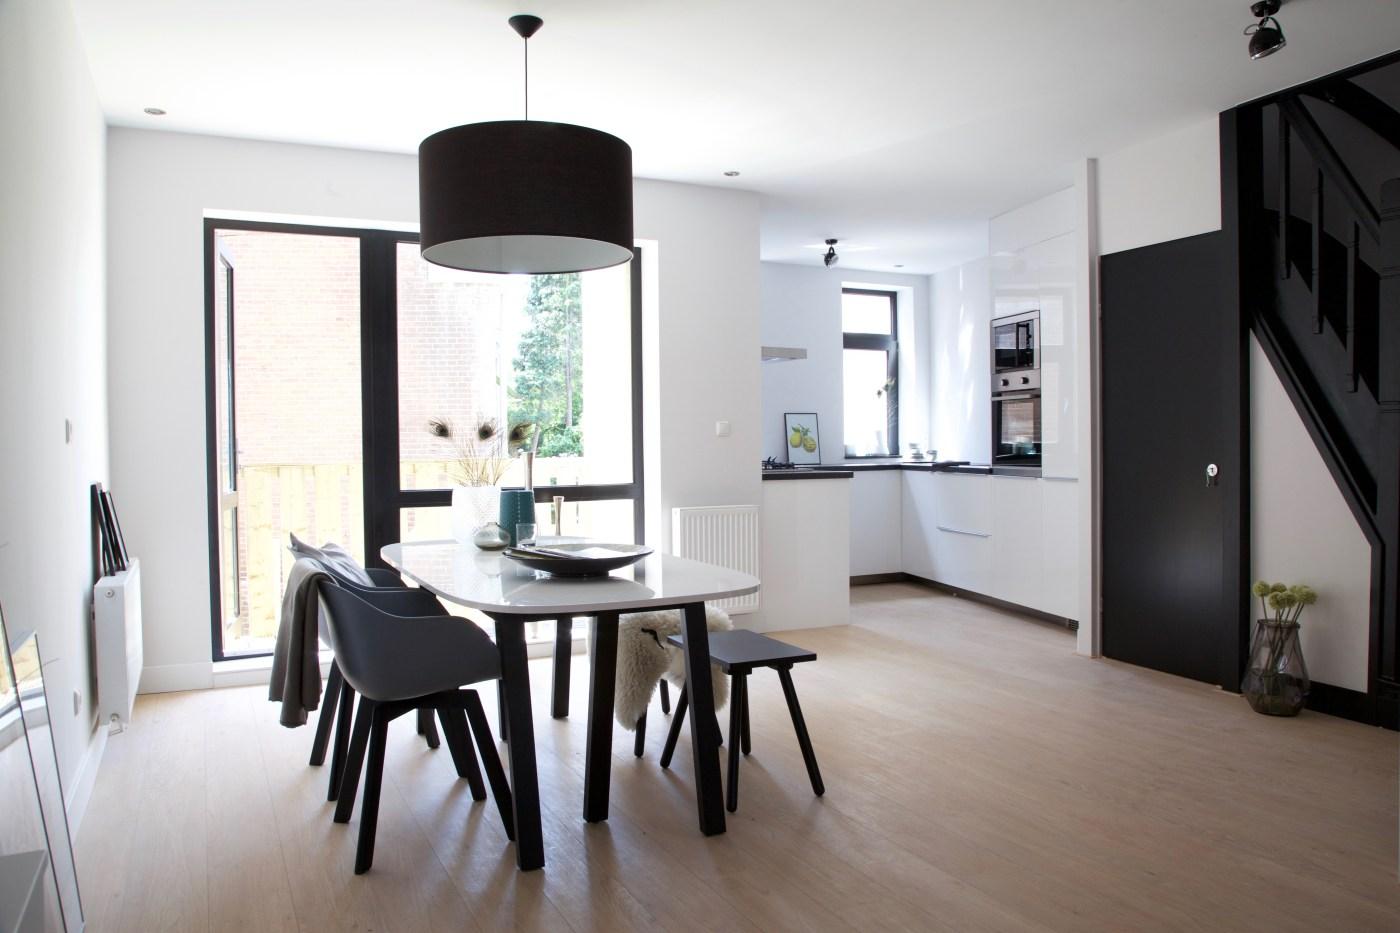 JaimyInterieur_Piron woonkamer eettafel